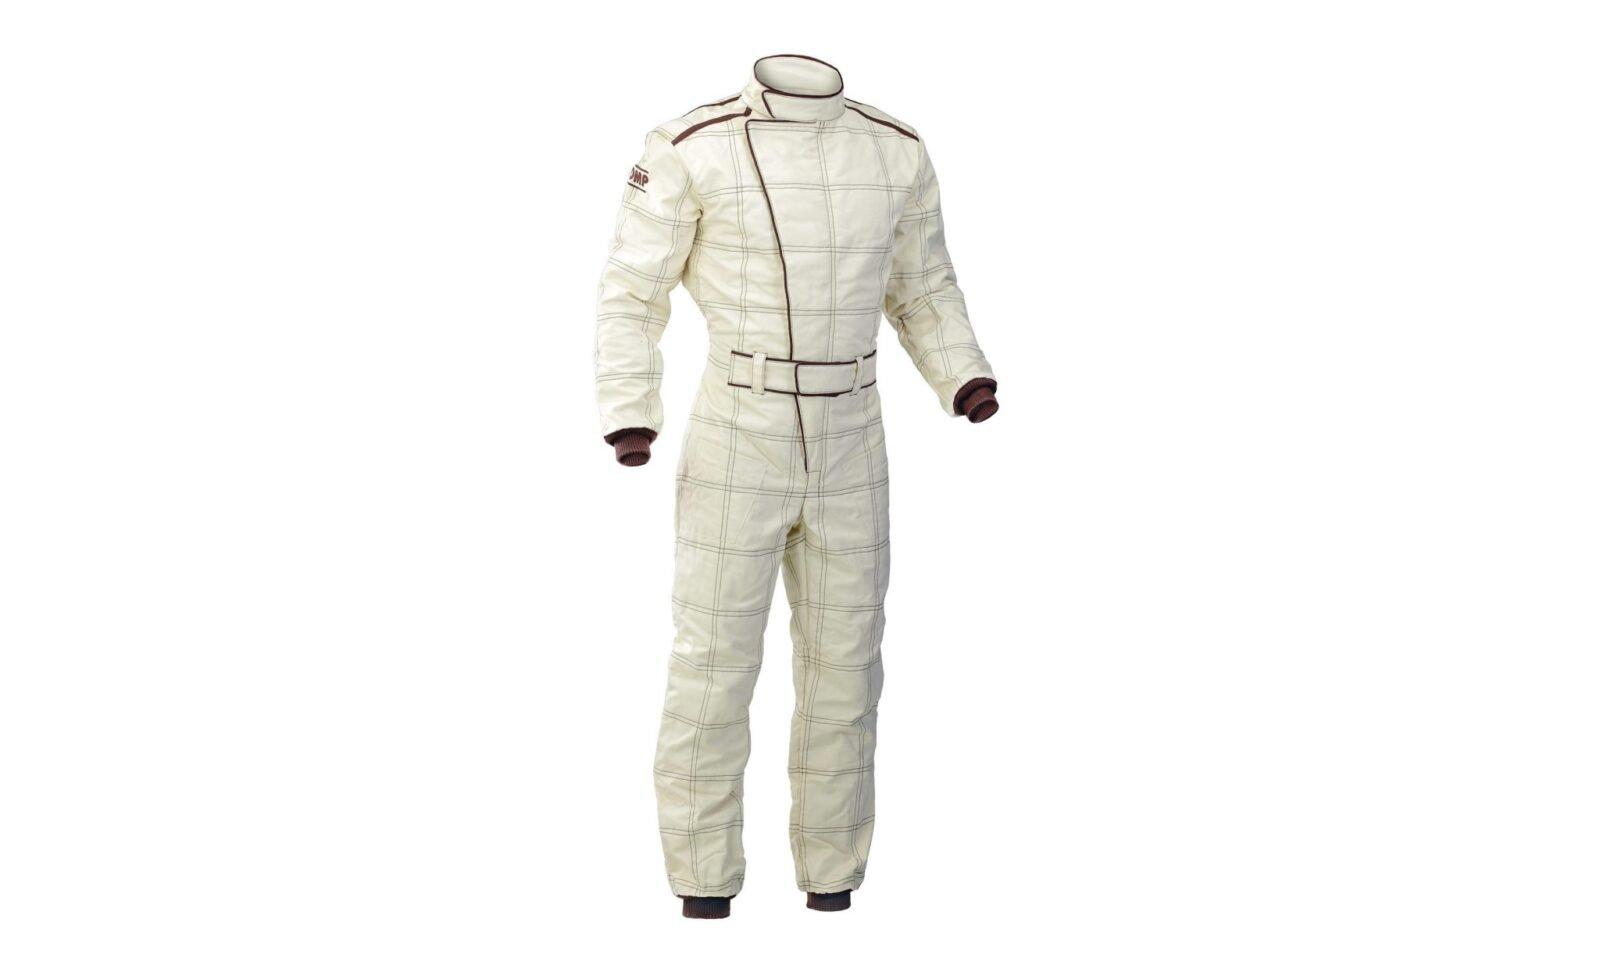 OMP Le Mans Race Suit 1600x976 - OMP Le Mans Race Suit